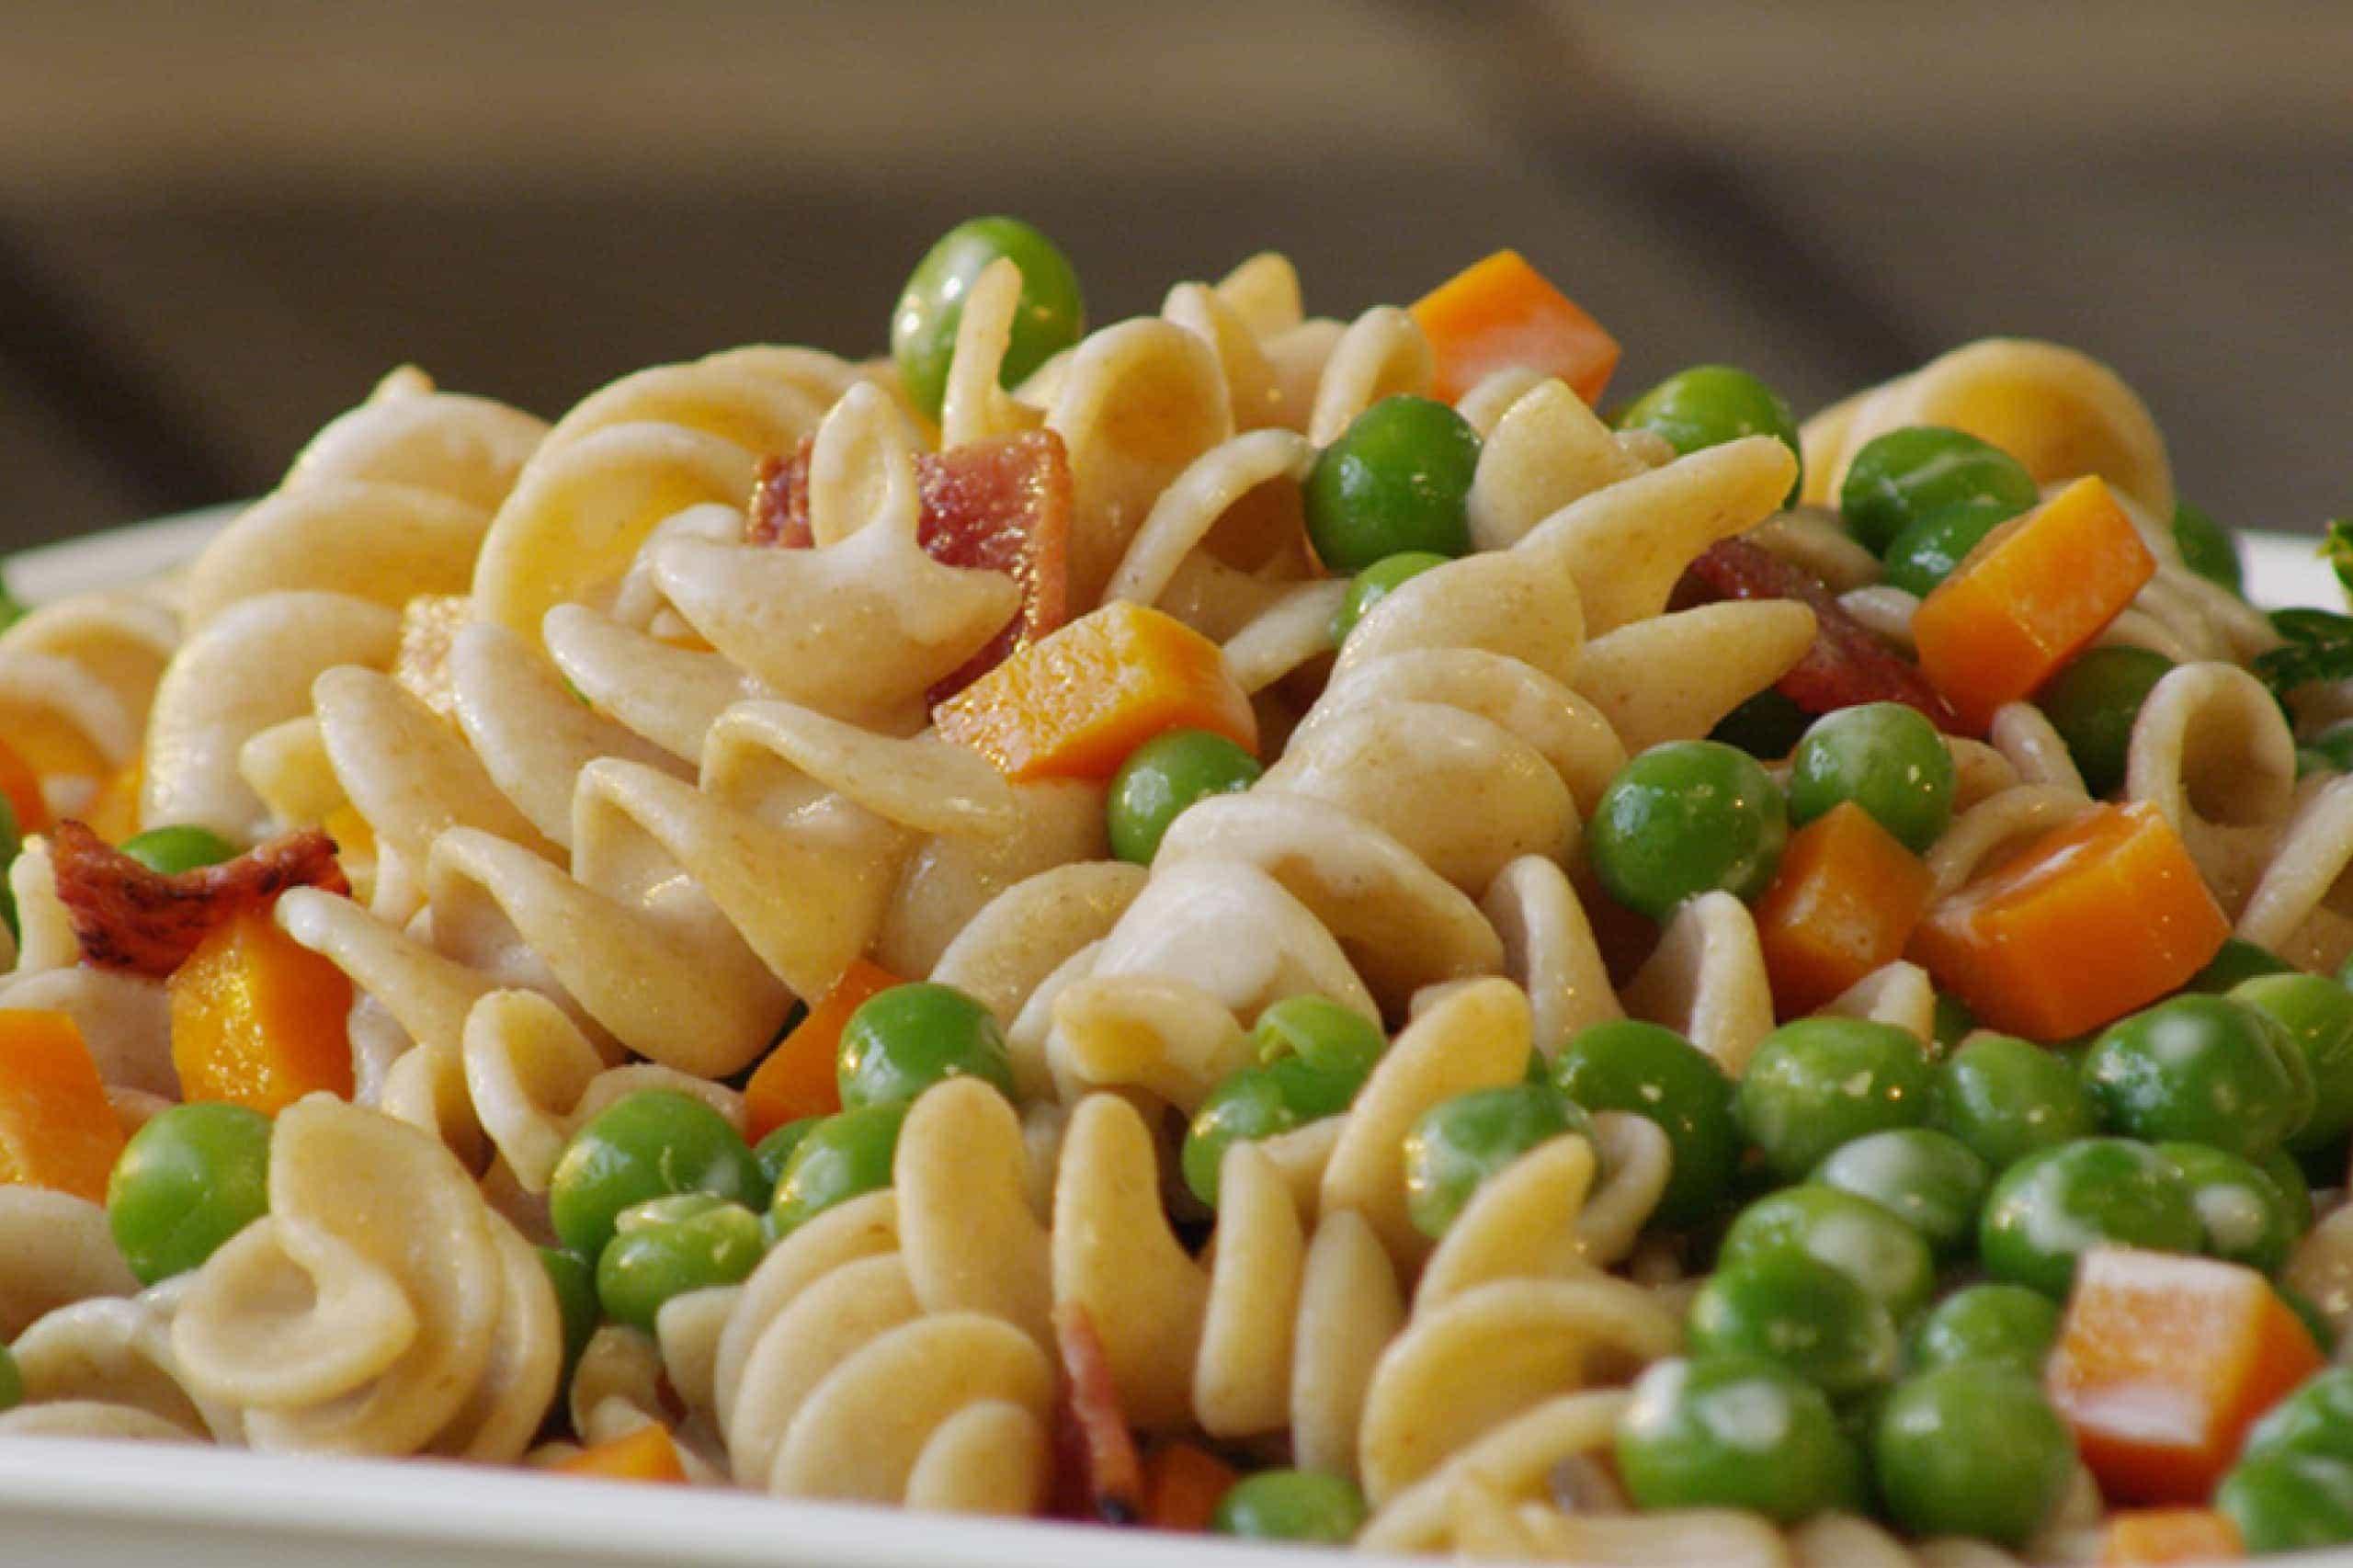 Pea Salad Recipes With Pasta